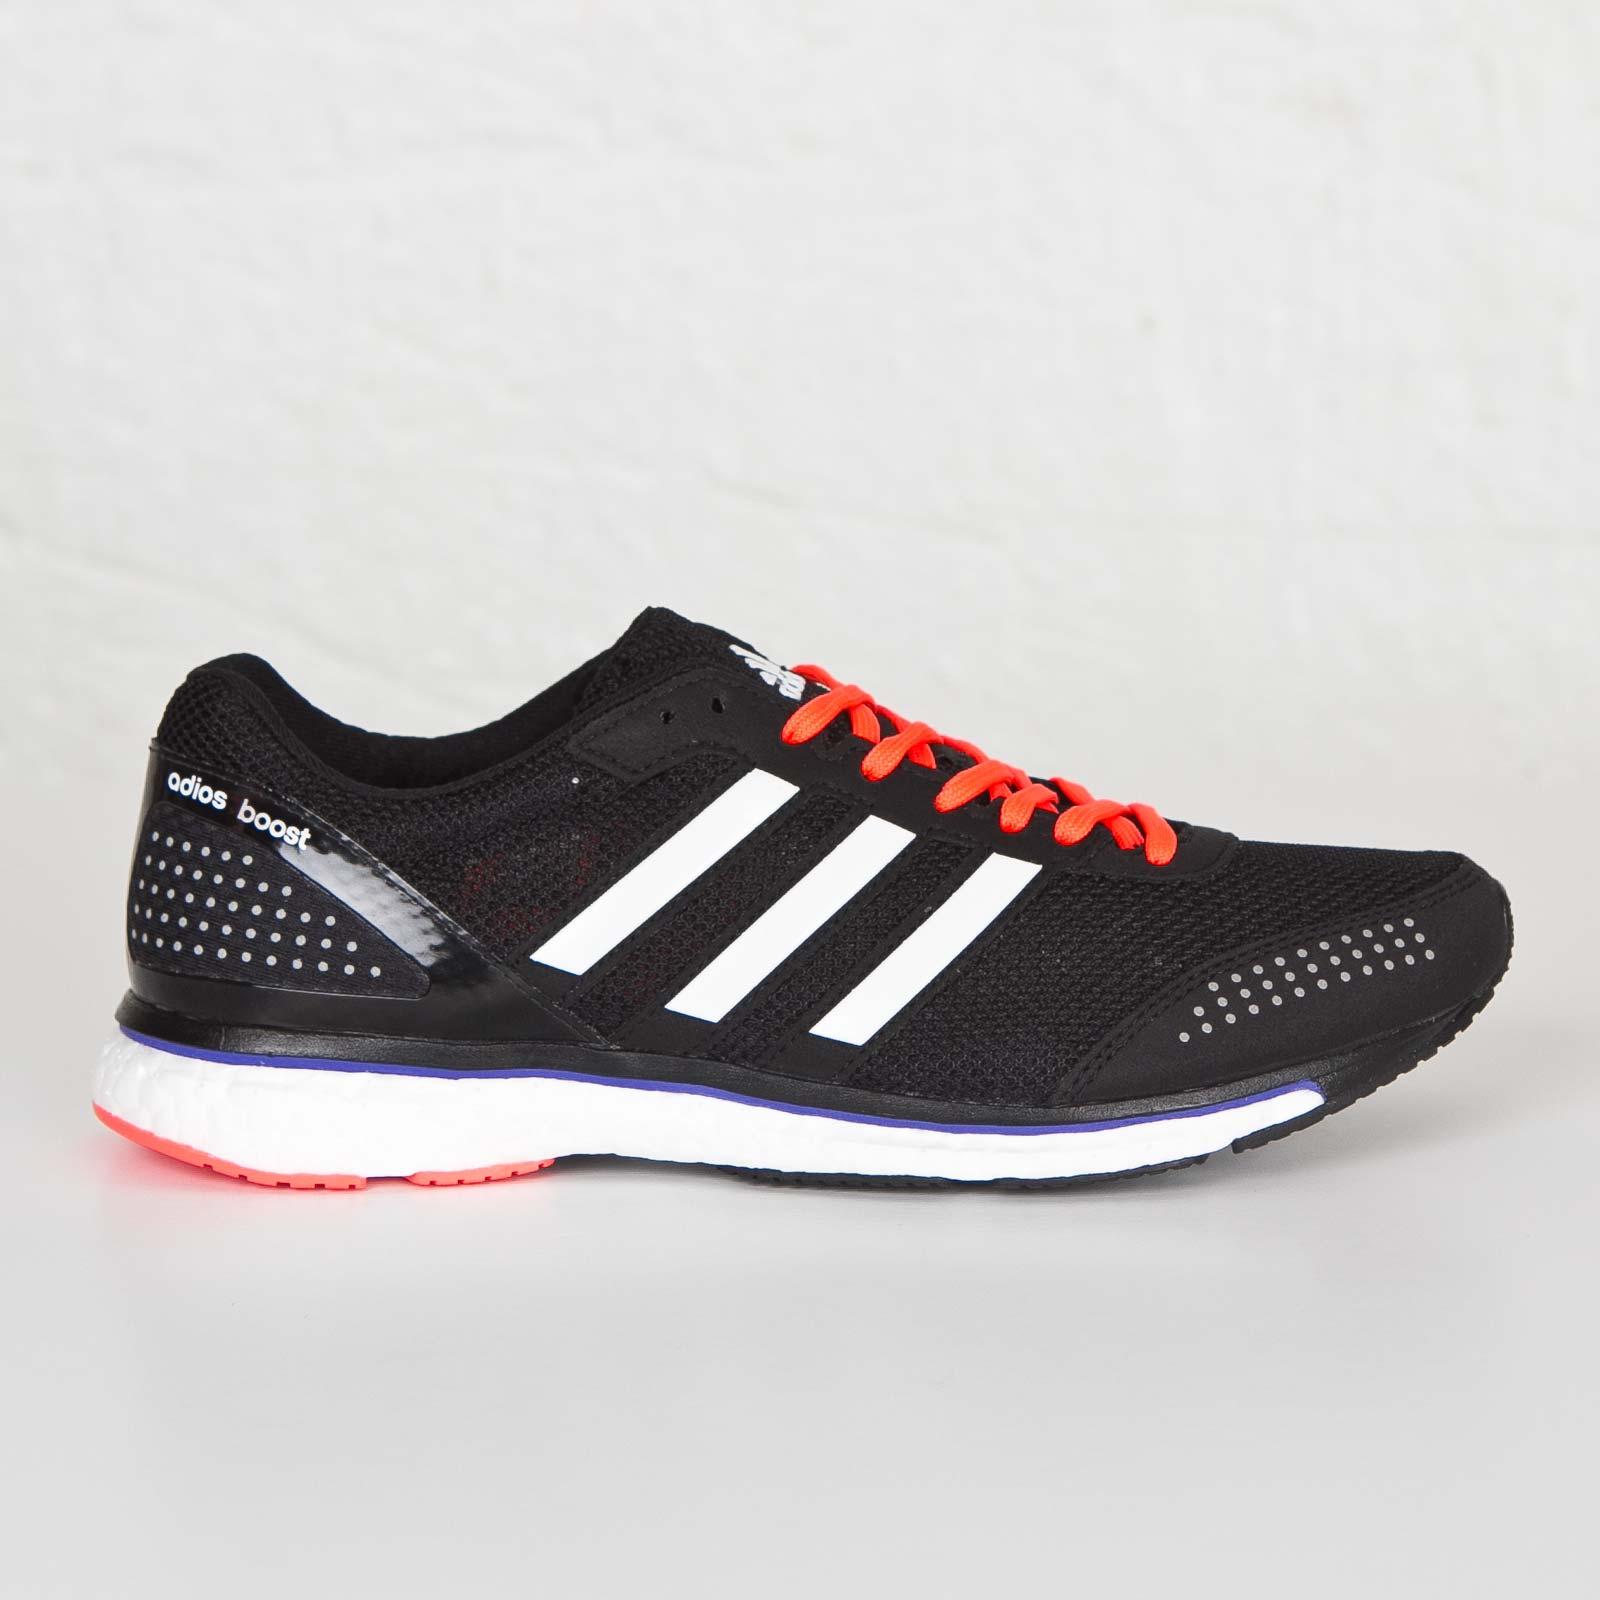 1b2676fbbf89e4 adidas adizero adios boost 2 m - B22870 - Sneakersnstuff